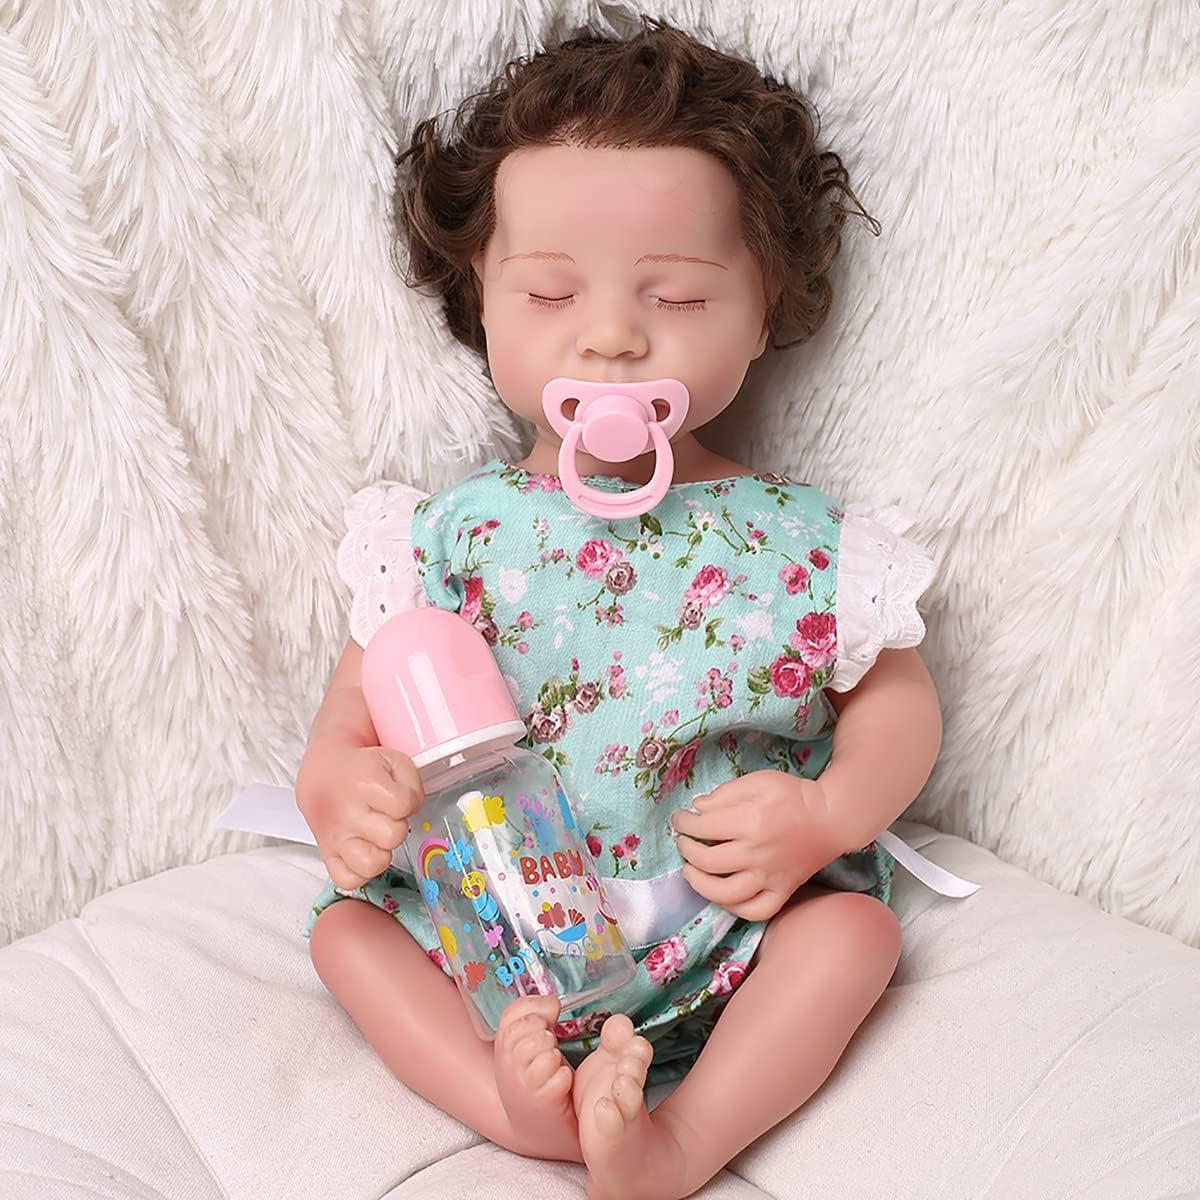 HFSKJWI Lifelike Sleep Rebirth Tucson Mall Baby Max 48% OFF Bab Soft Silicone Doll Vinyl